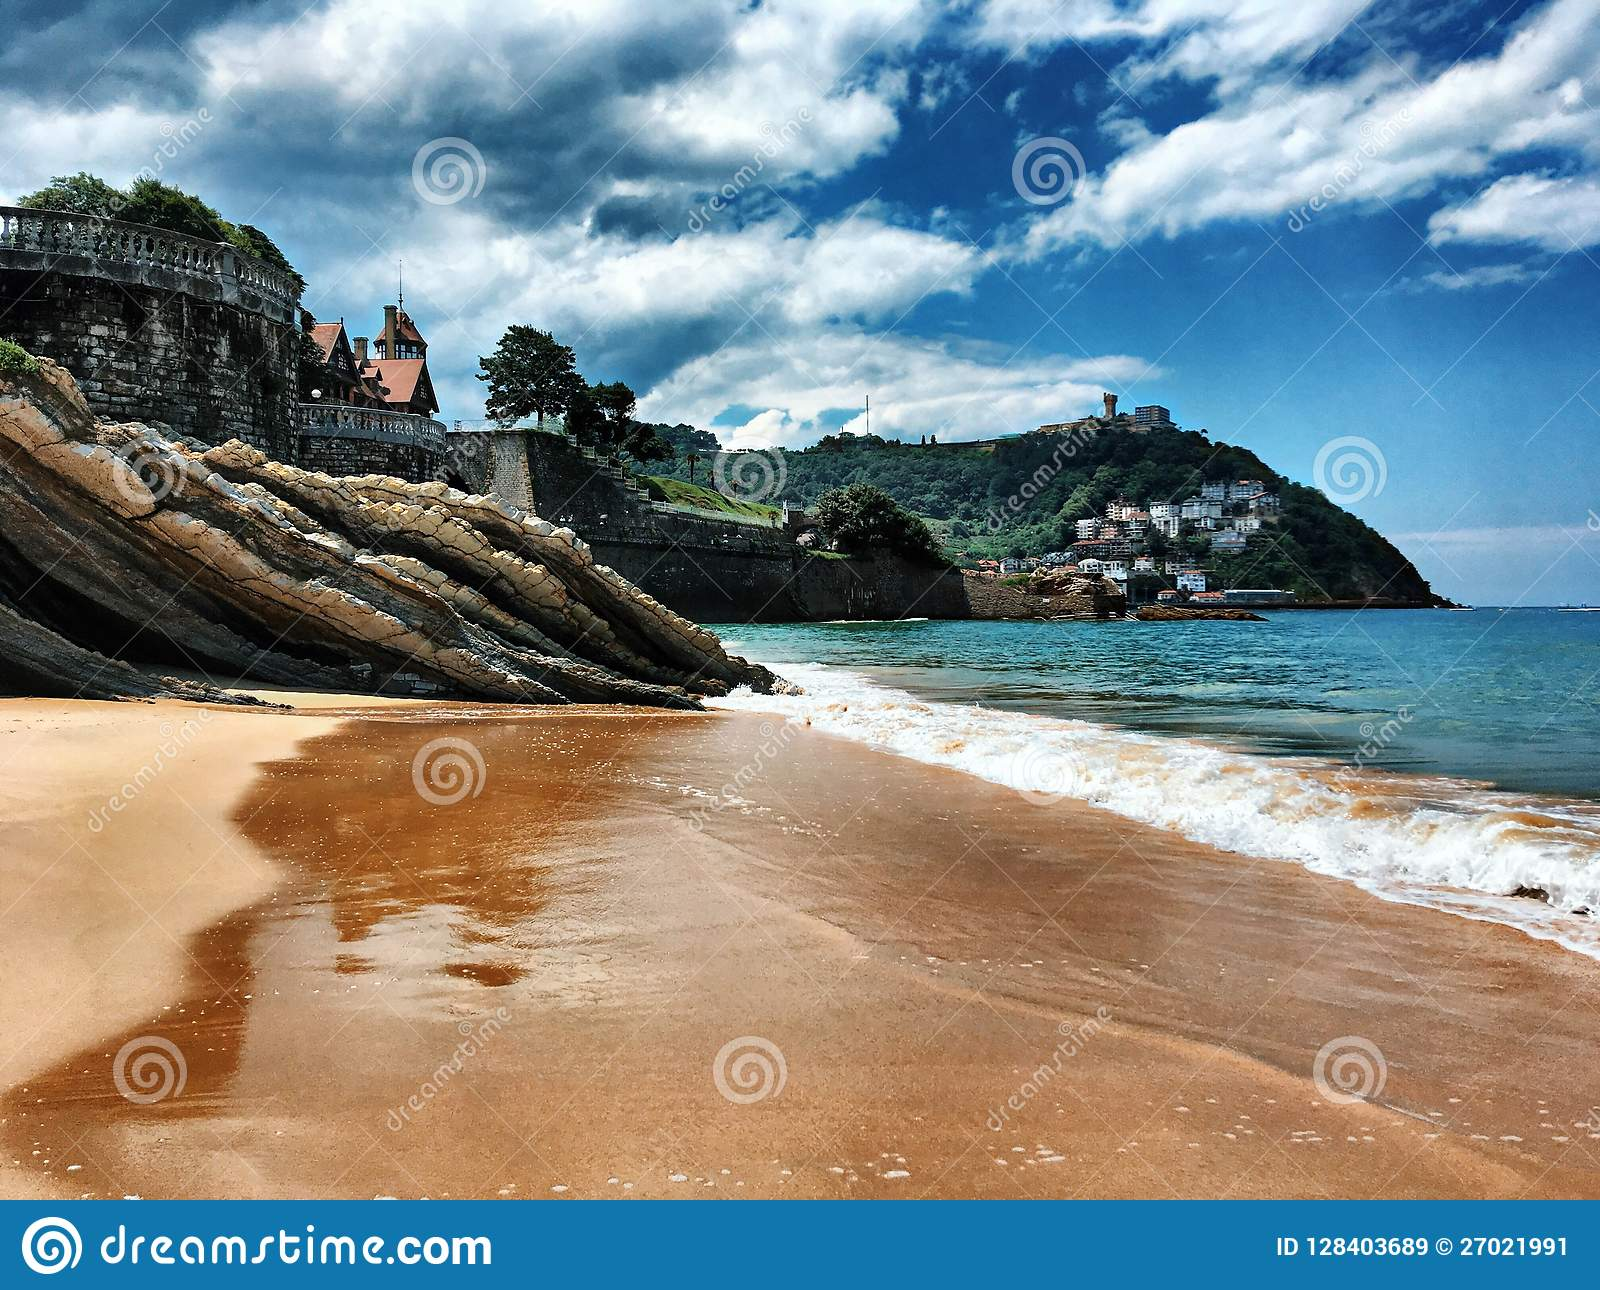 spain san sebastian beach summer 2018 stock image - image of blue